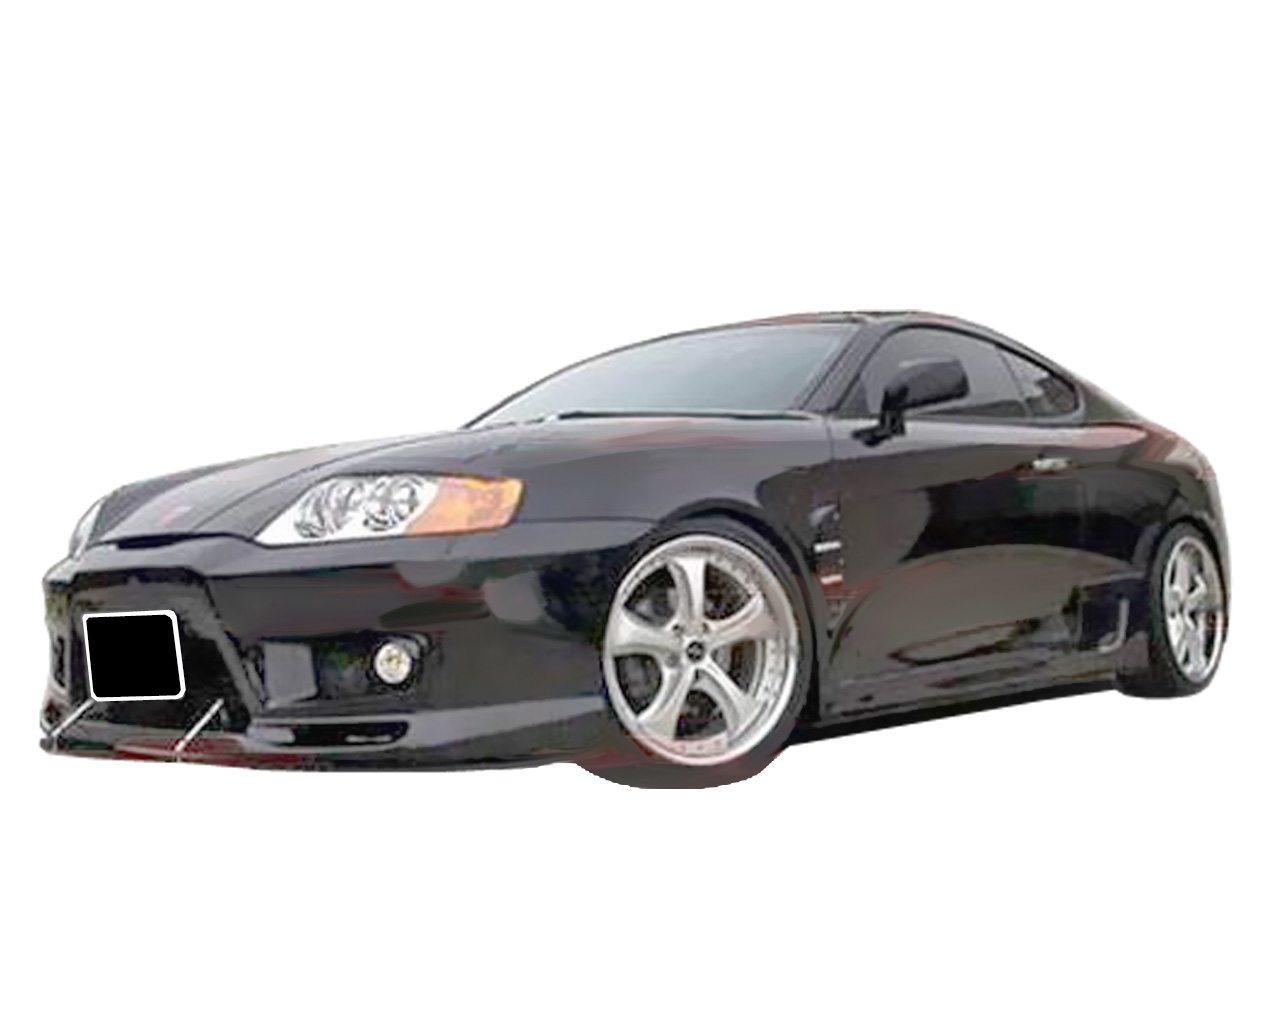 Hyundai-2003-Coupe-Frt-PCM018